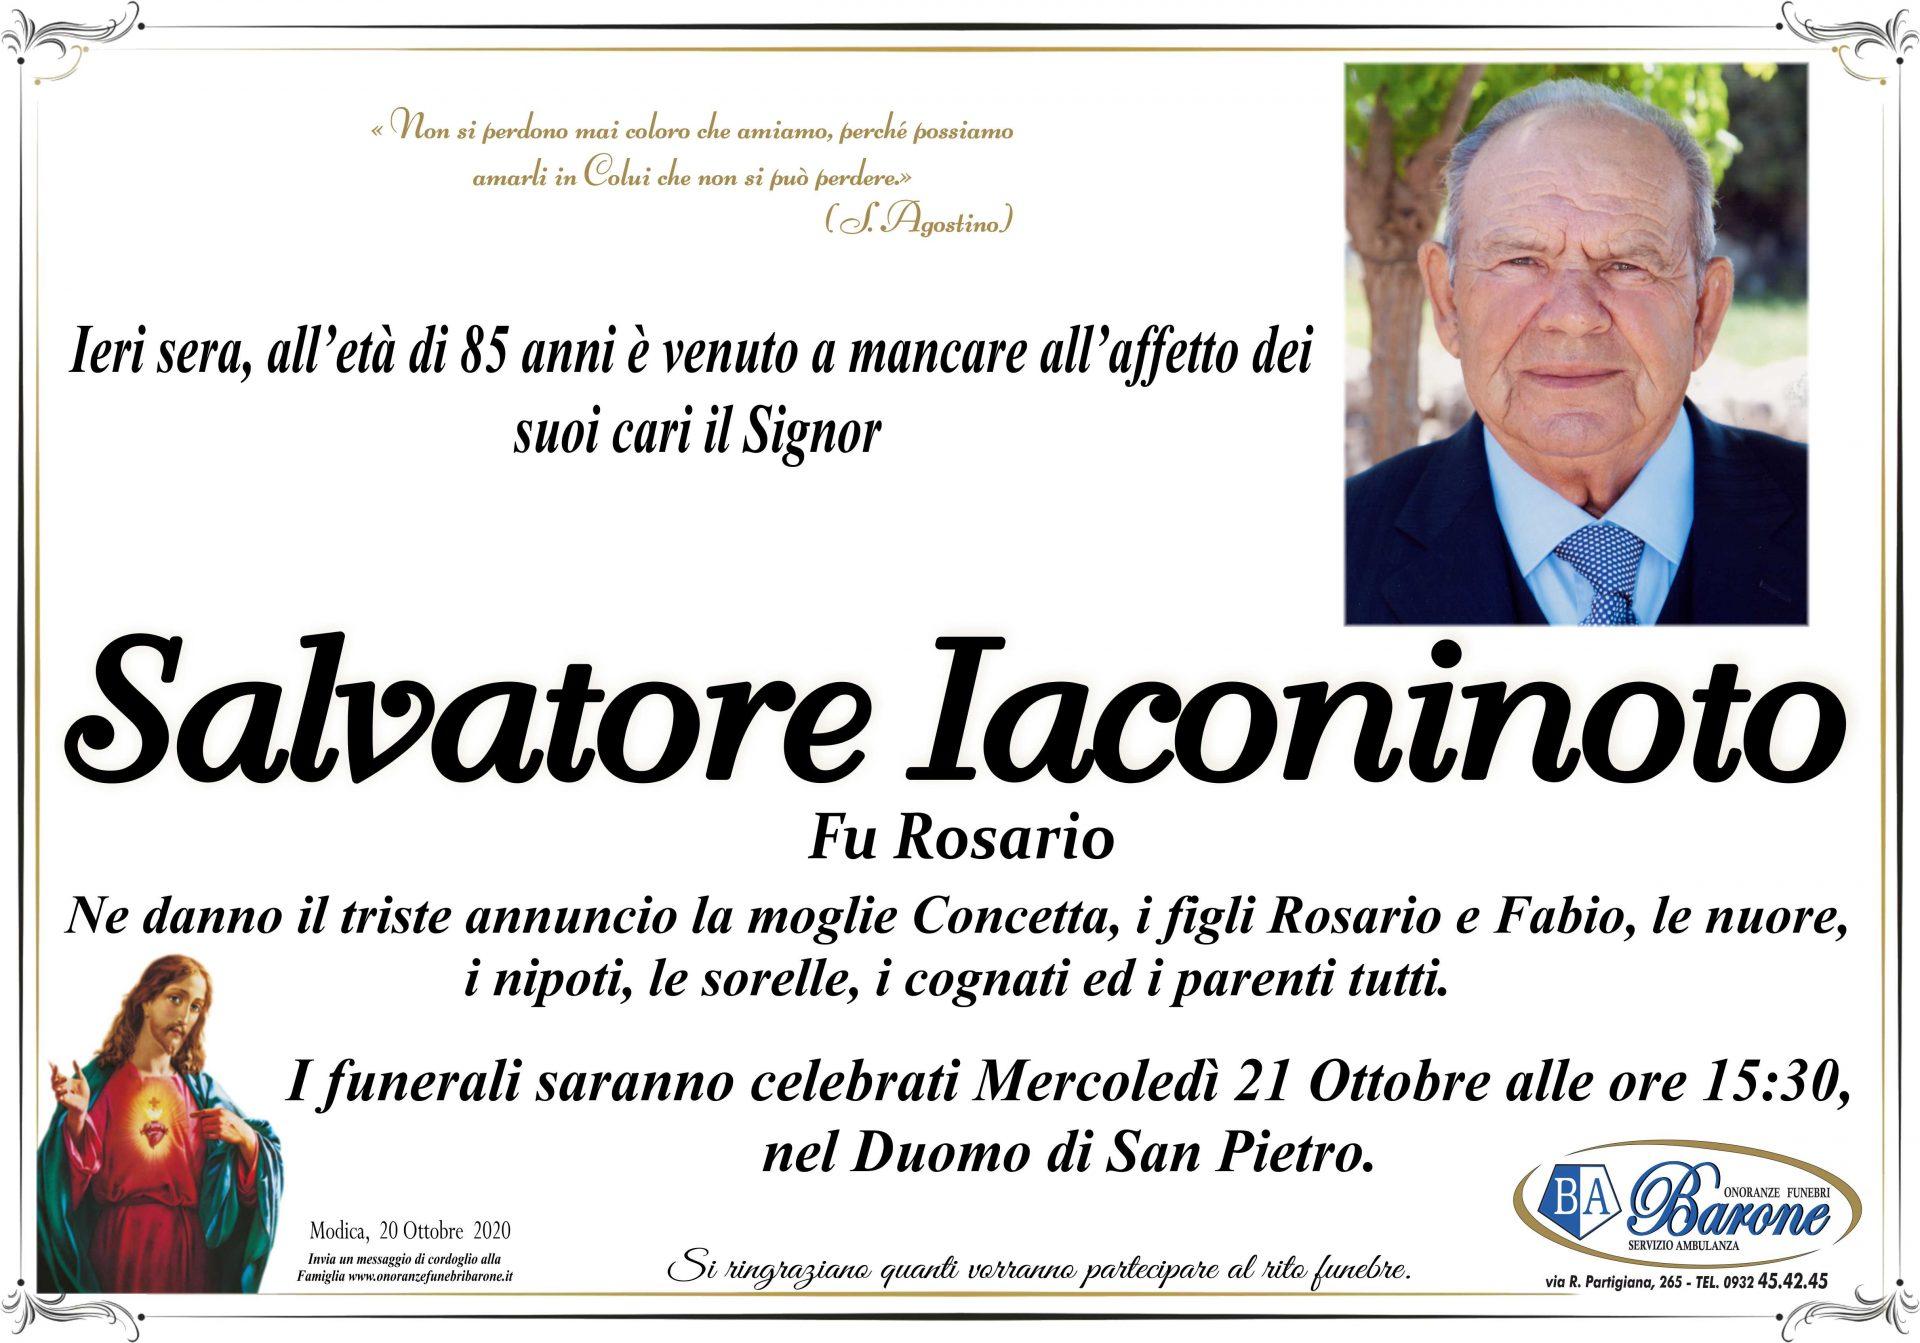 Salvatore Iaconinoto